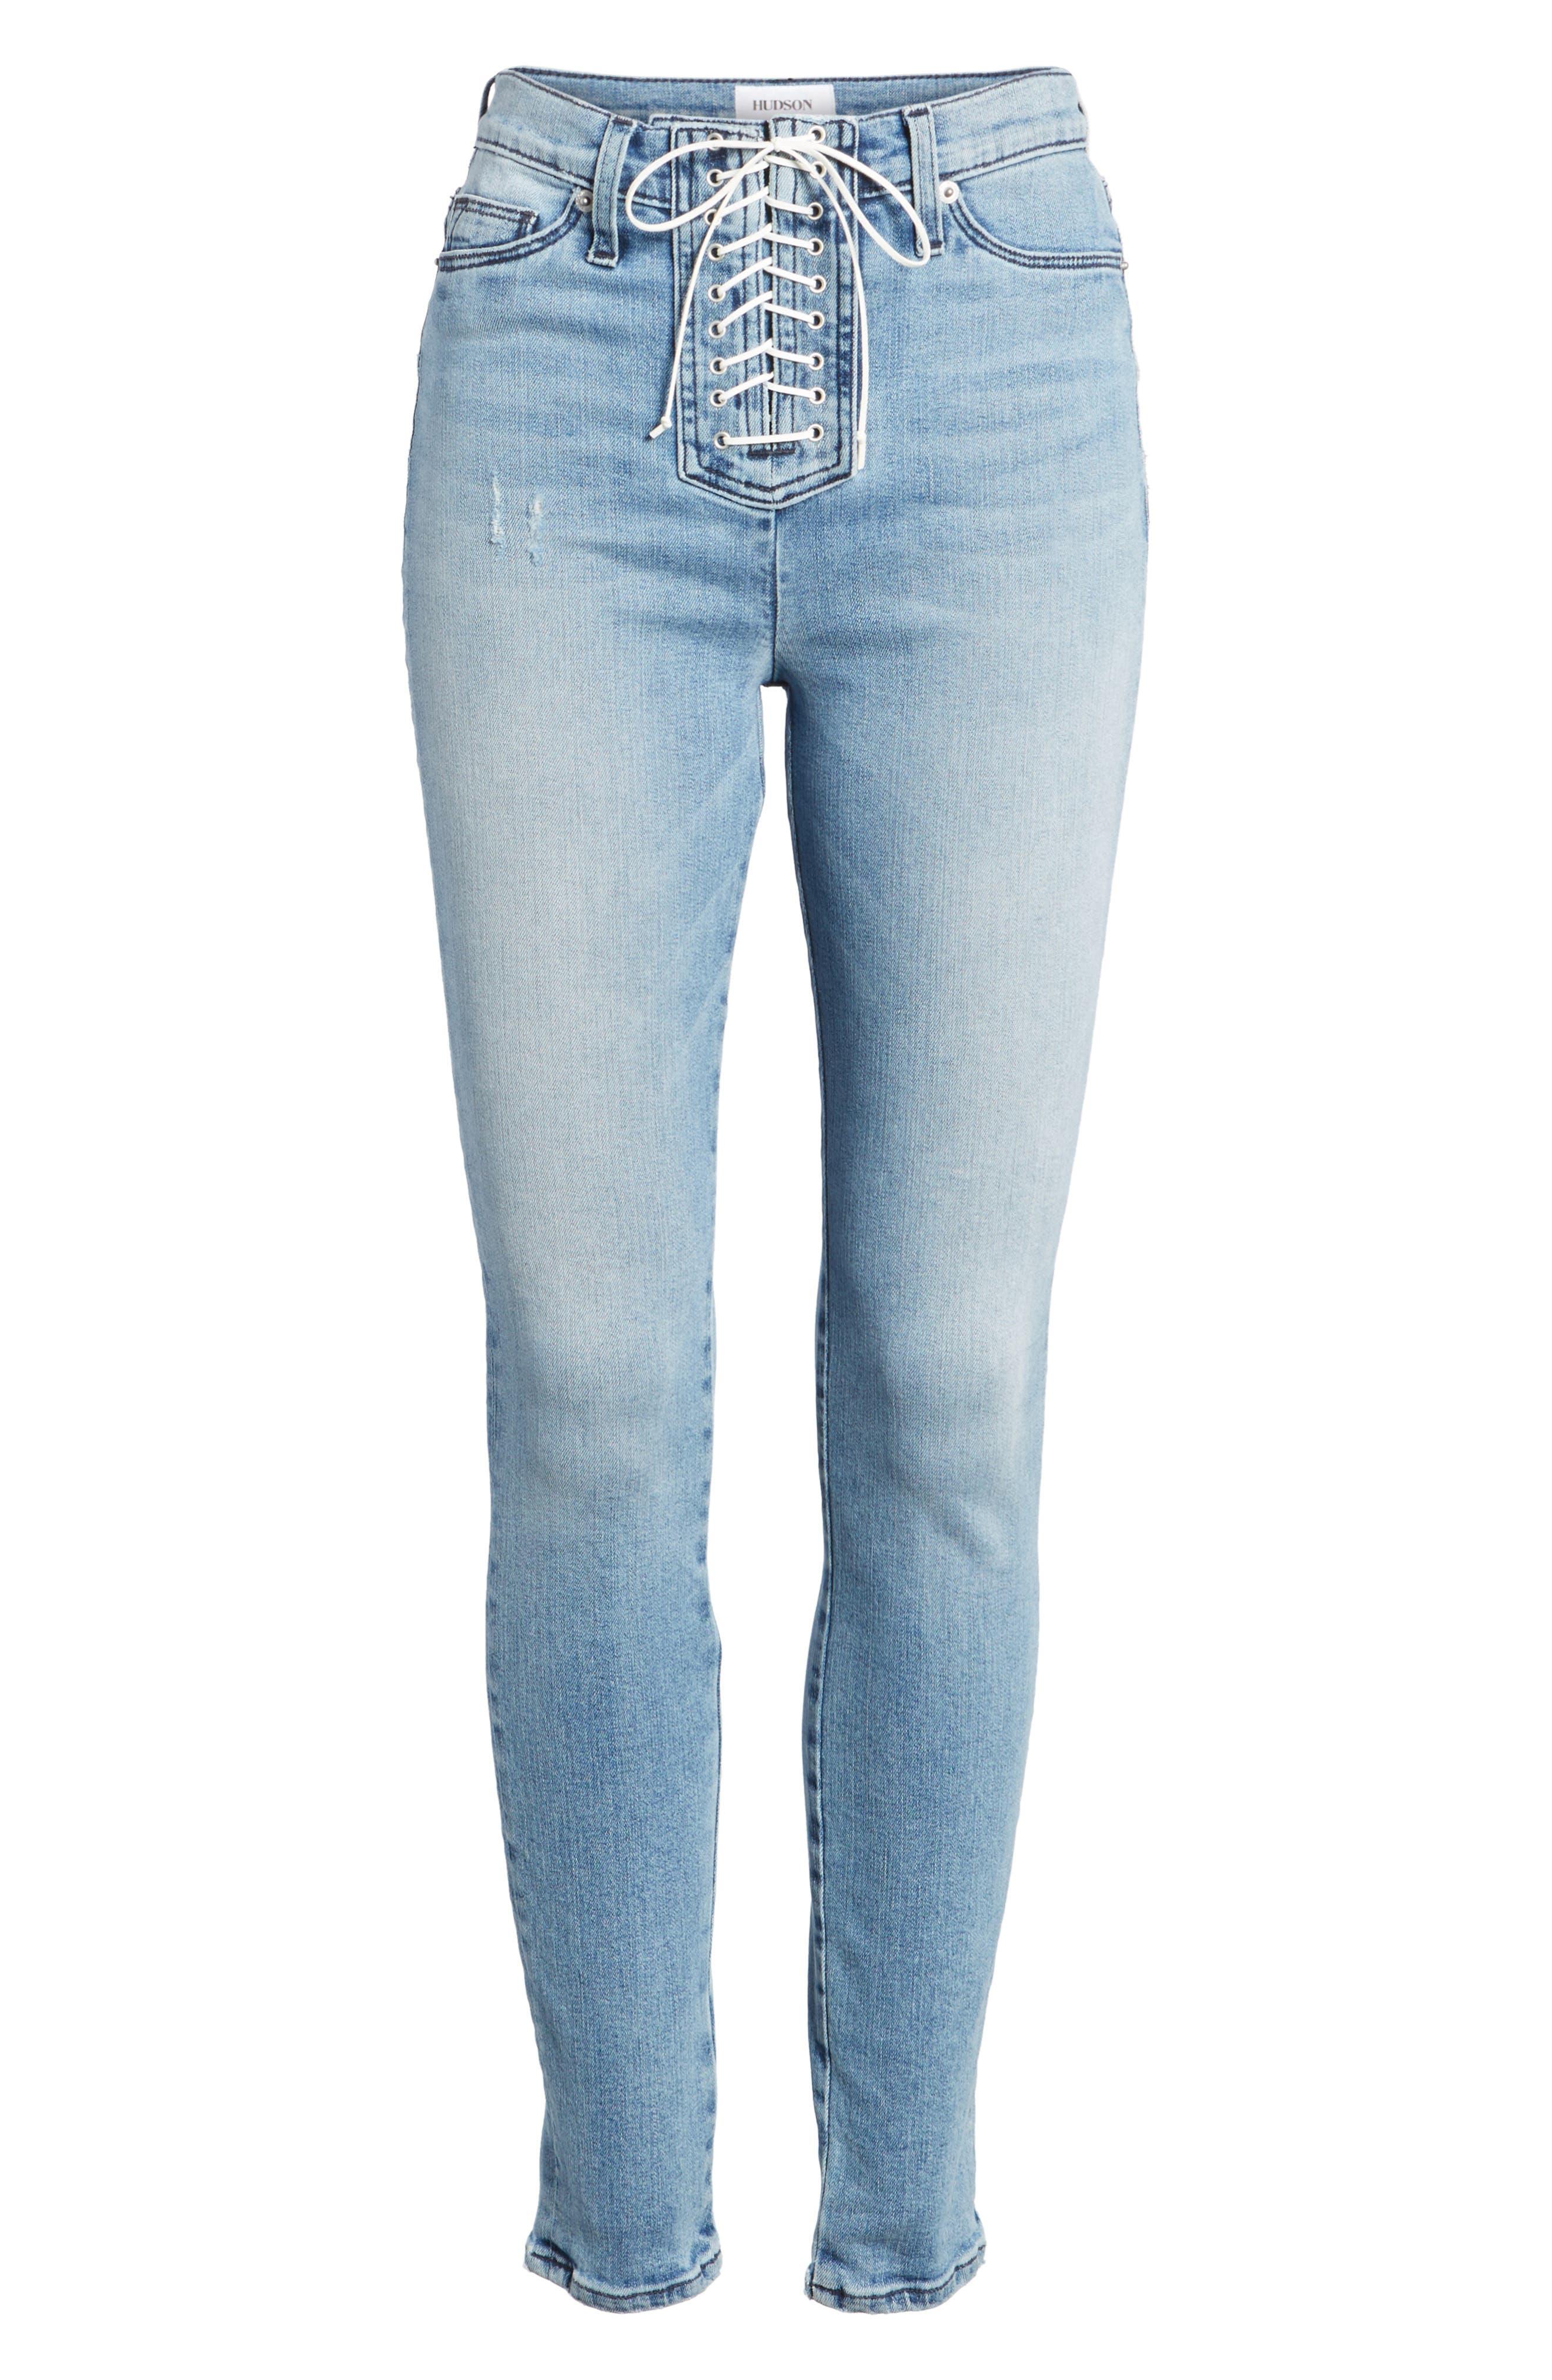 Bullocks Lace-Up High Waist Super Skinny Jeans,                             Alternate thumbnail 13, color,